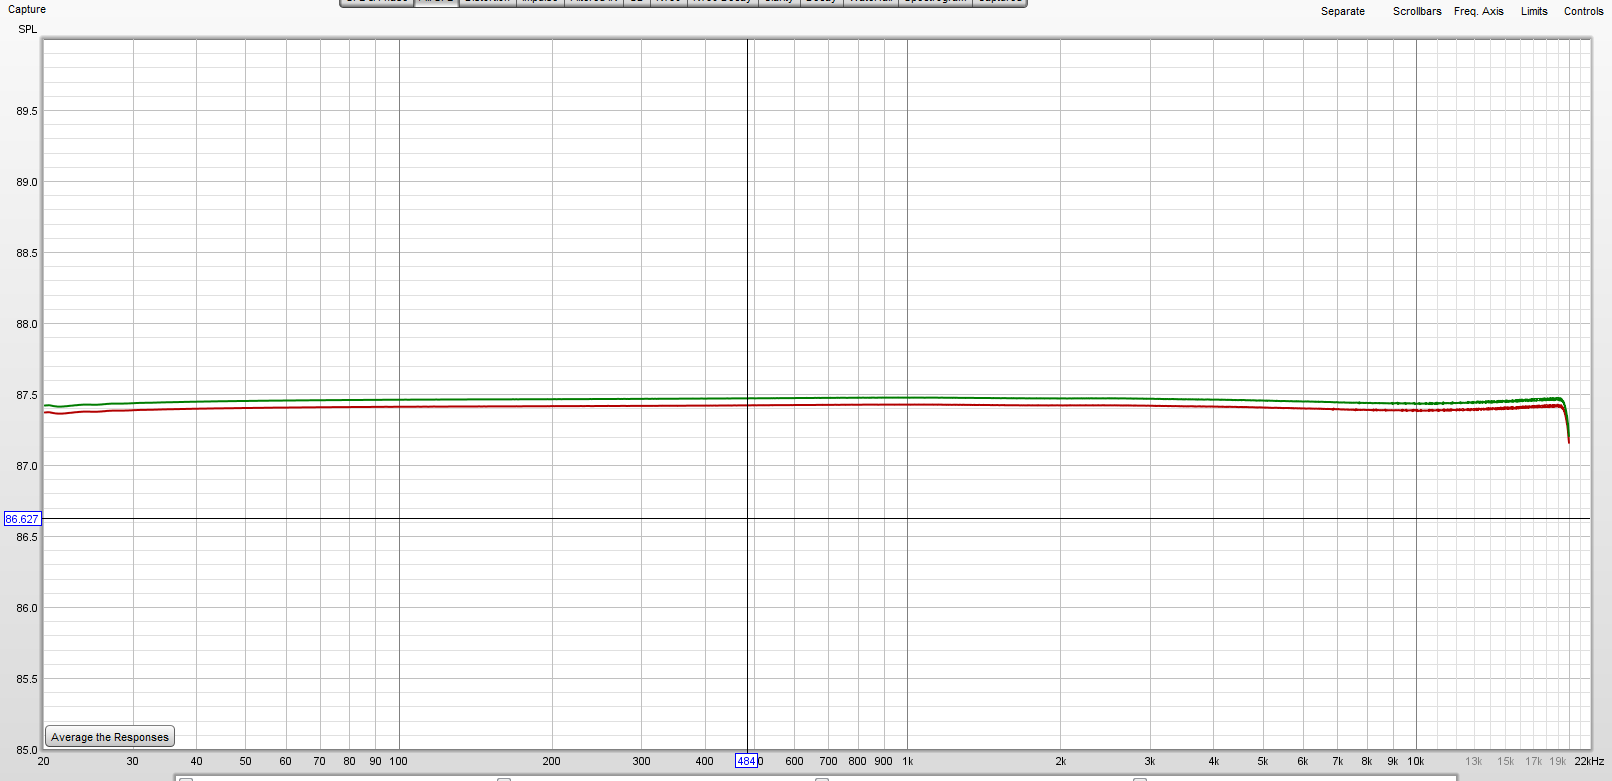 REW_d30_pro_filter9.PNG